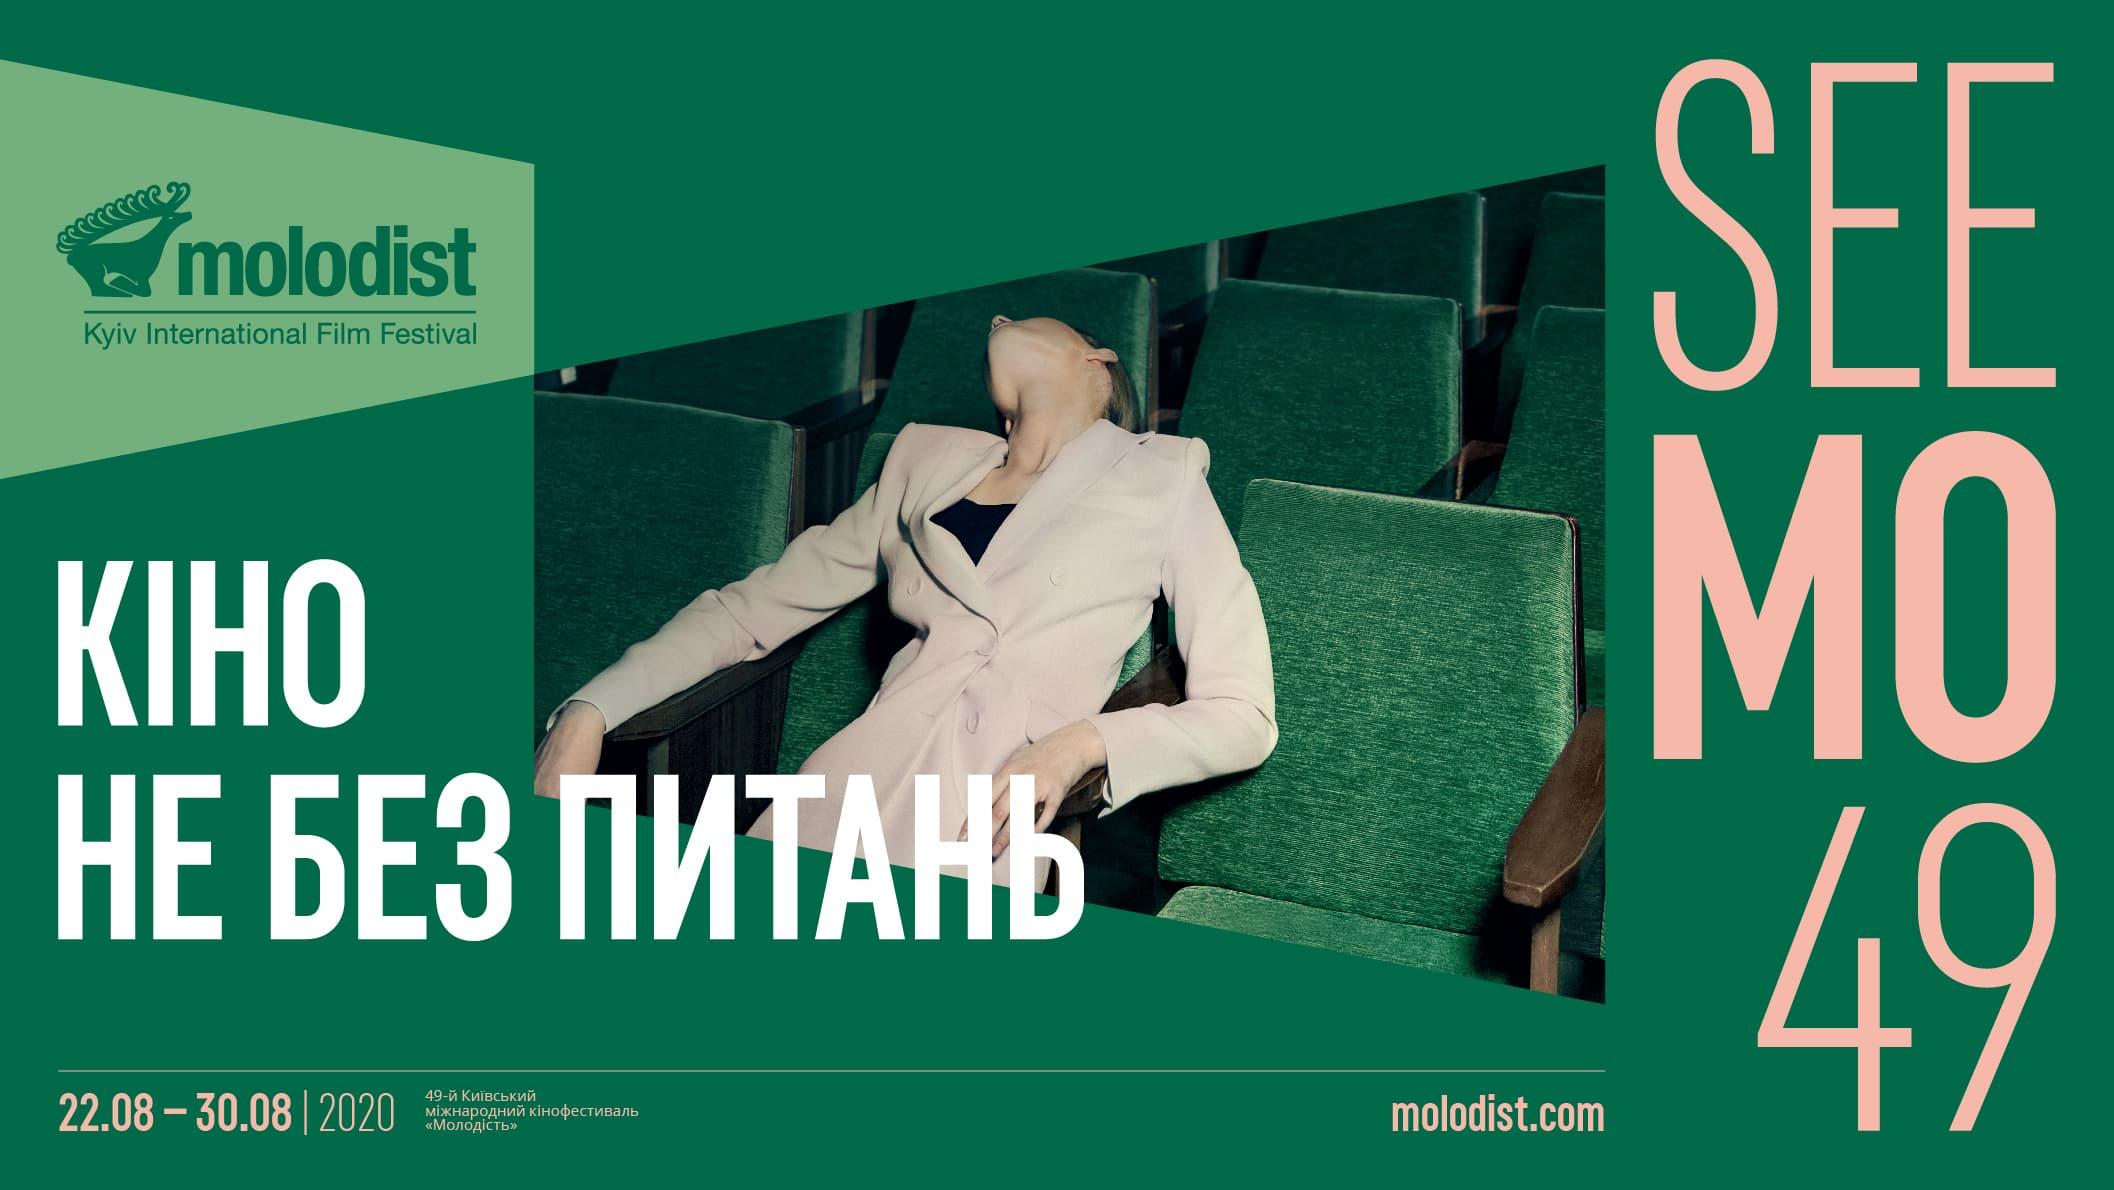 https://likeinua.com/wp-content/uploads/2020/08/Poster-SeeMo49-01.jpg